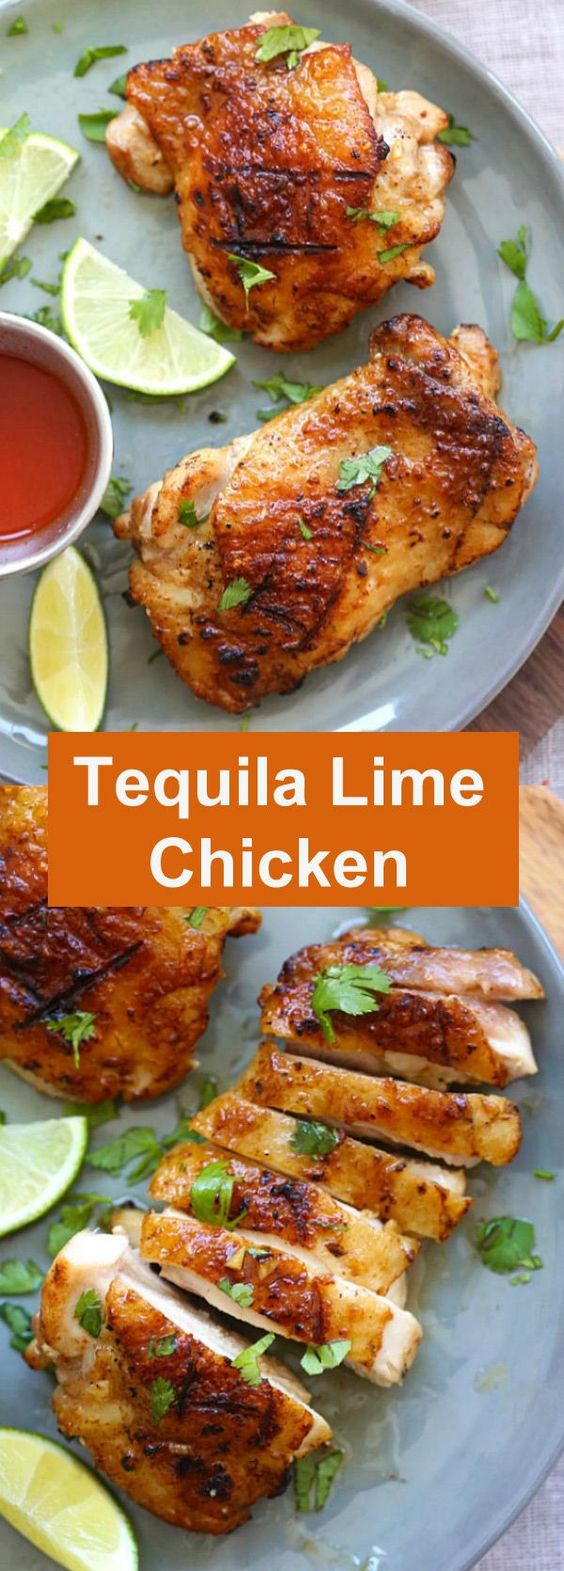 Tequila Lime Chicken - amazing chicken marinated with tequila, lime and garlic. This tequila lime chicken recipe tastes better than restaurant's   rasamalaysia.com